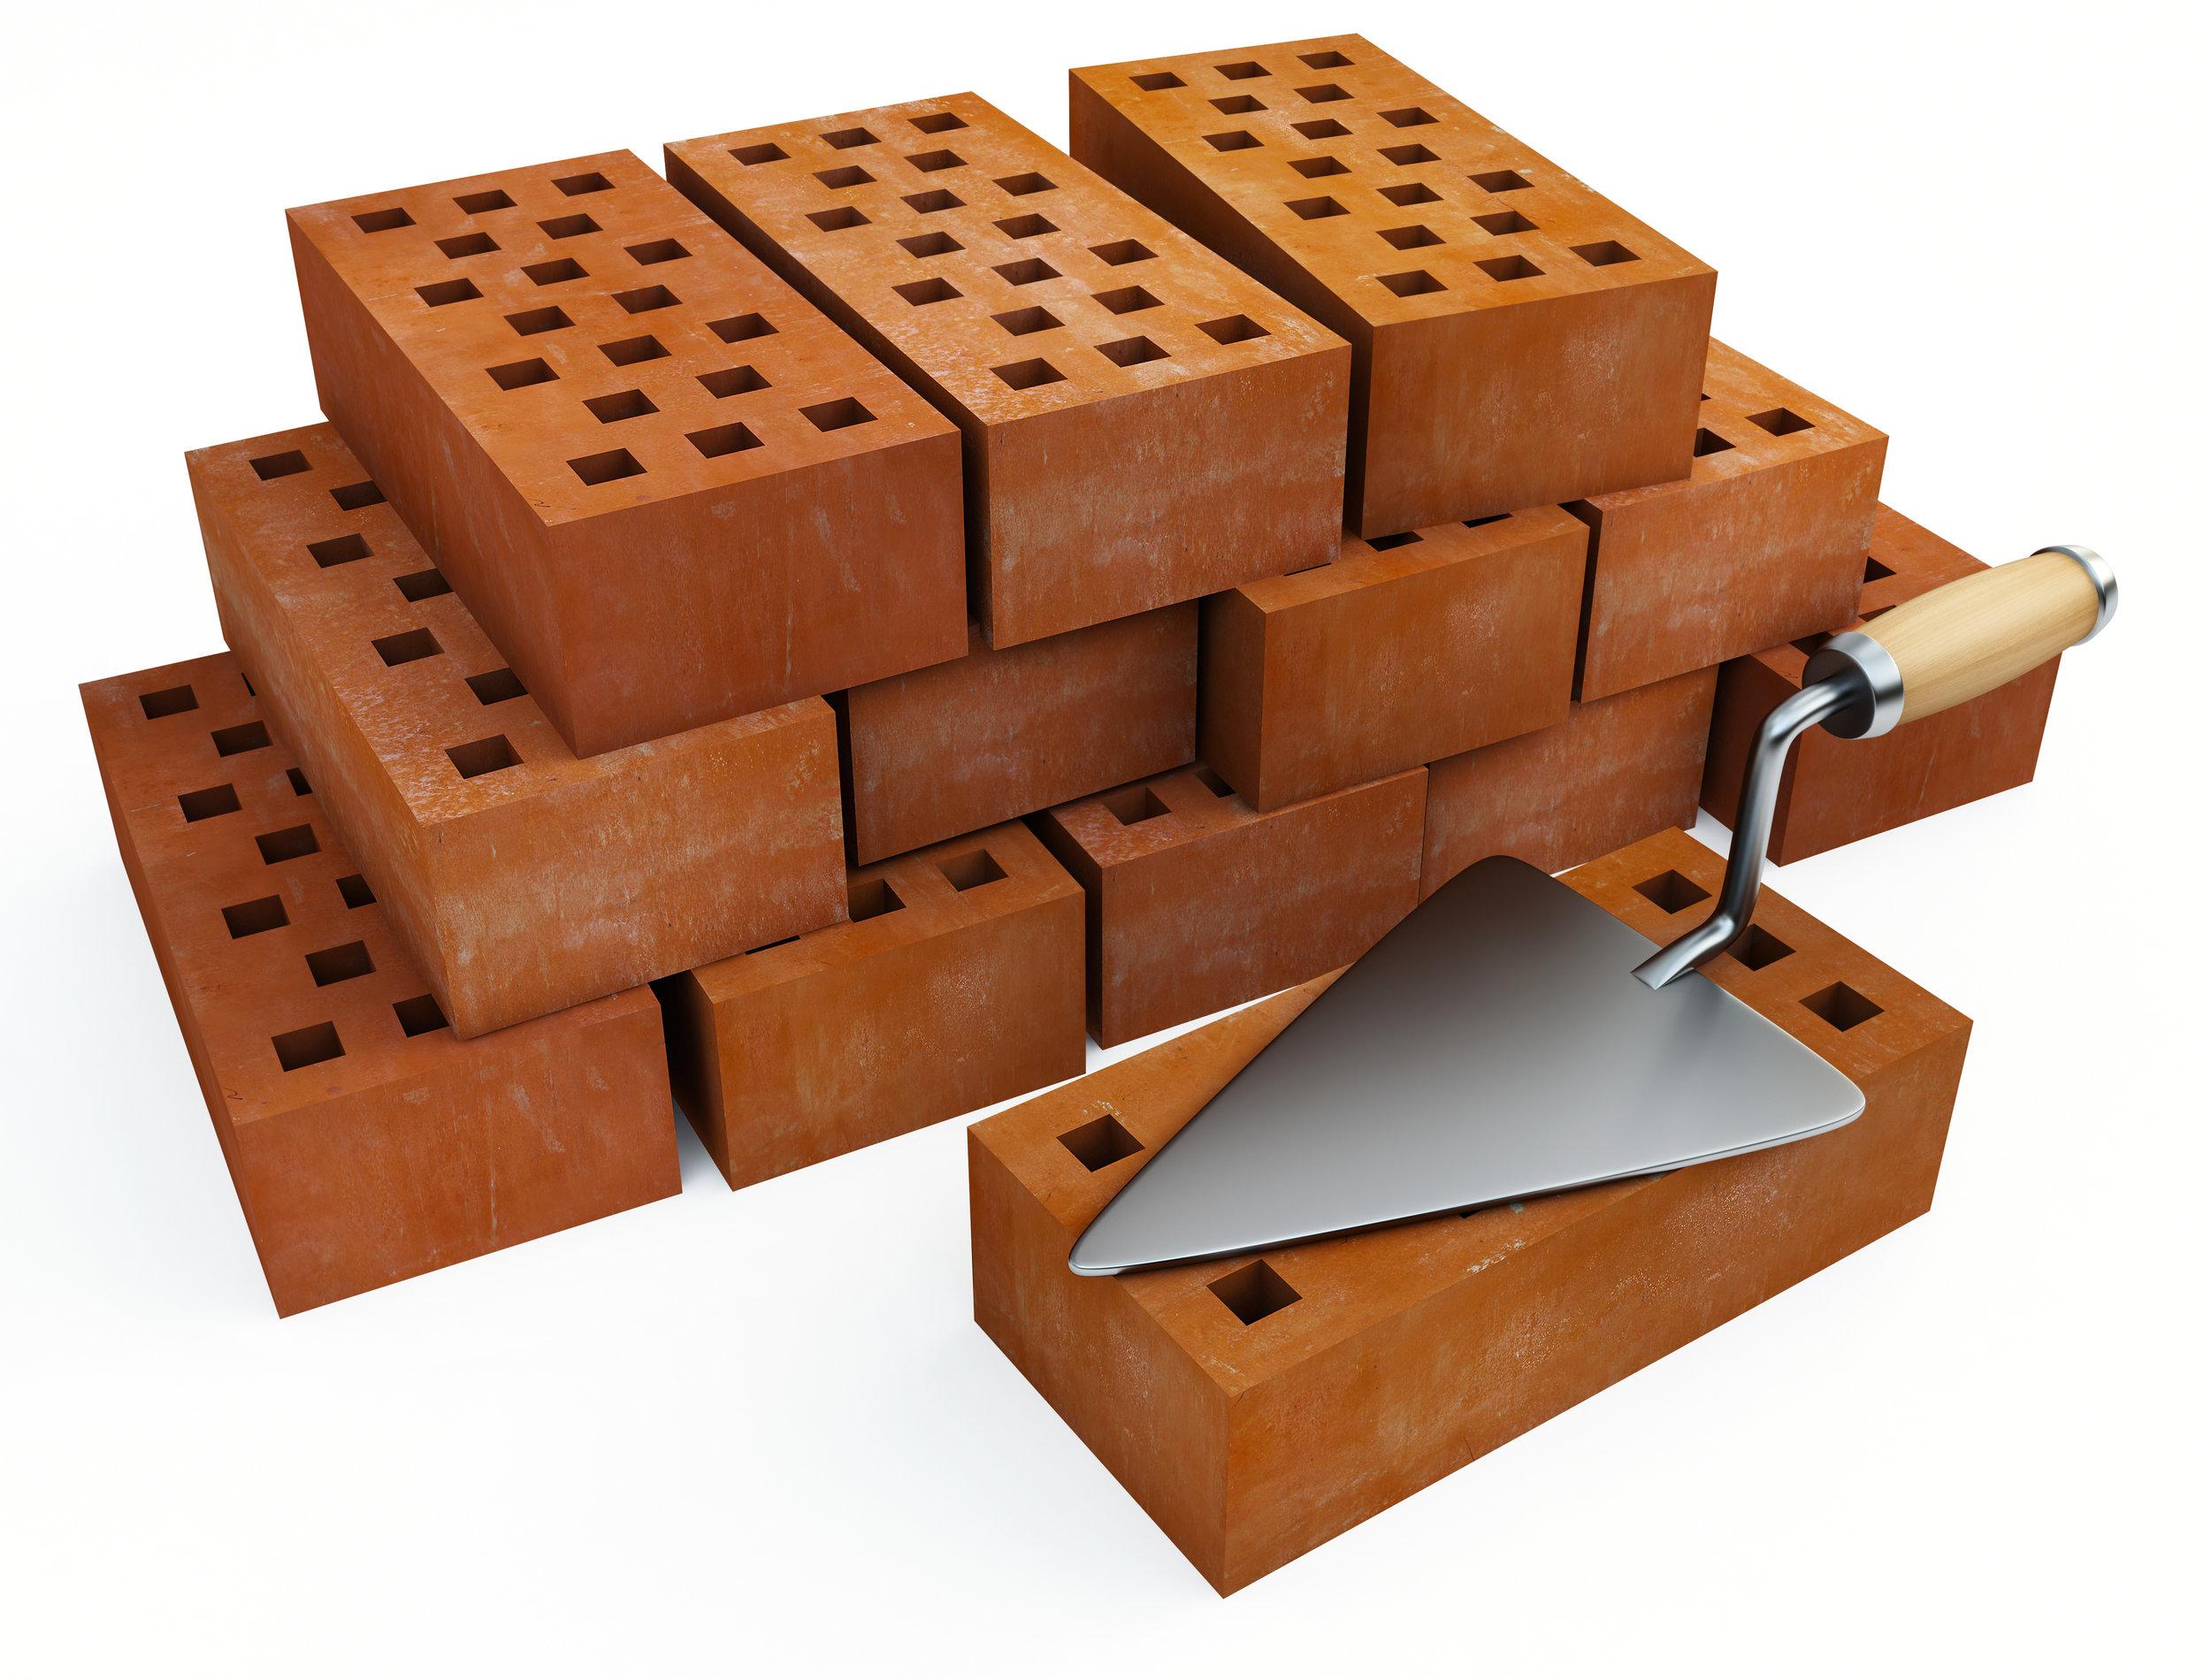 bricks Stacked.jpeg